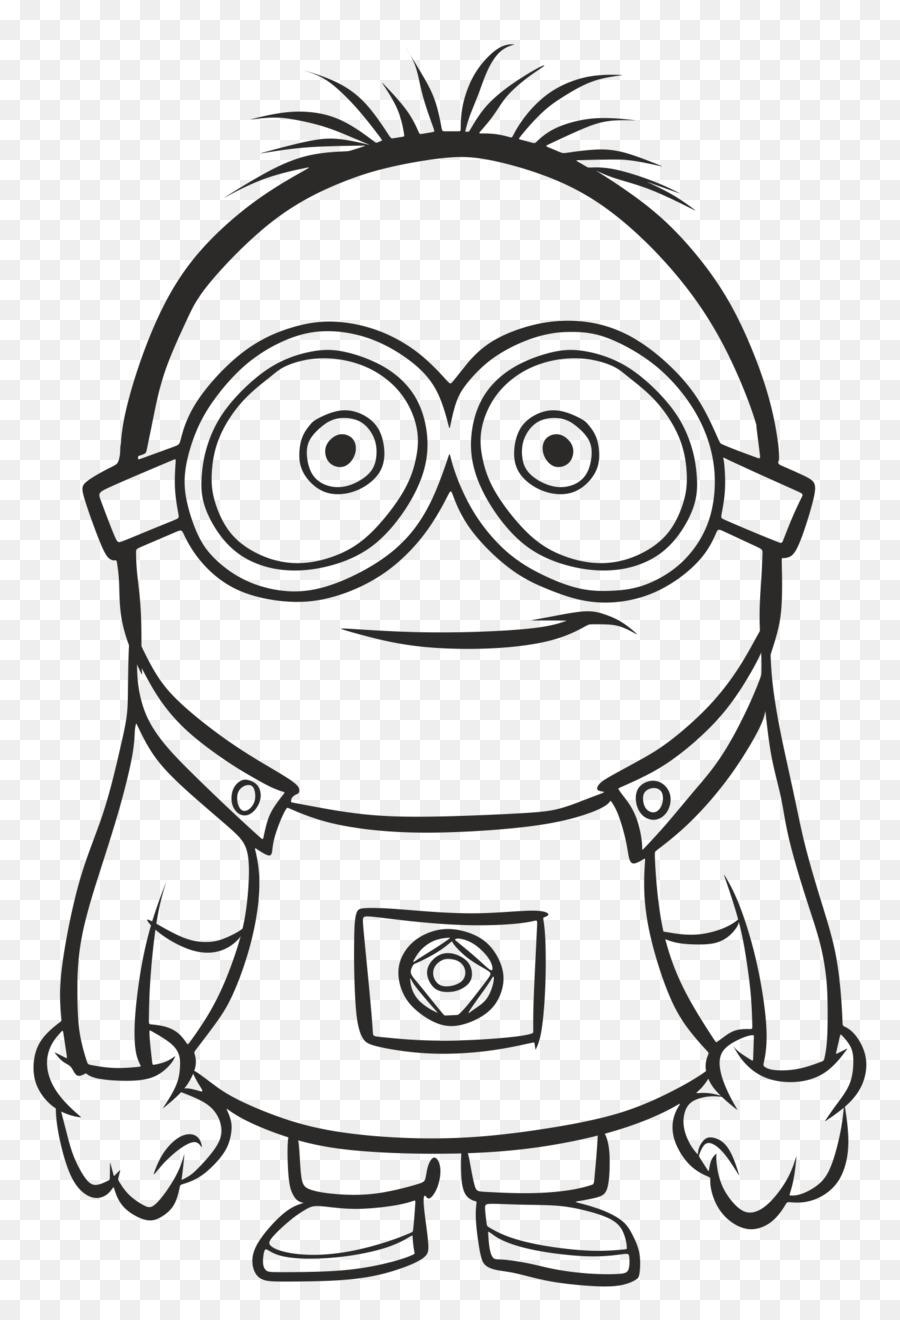 Gambar Kartun Minions Hitam Putih Wwwtollebildcom